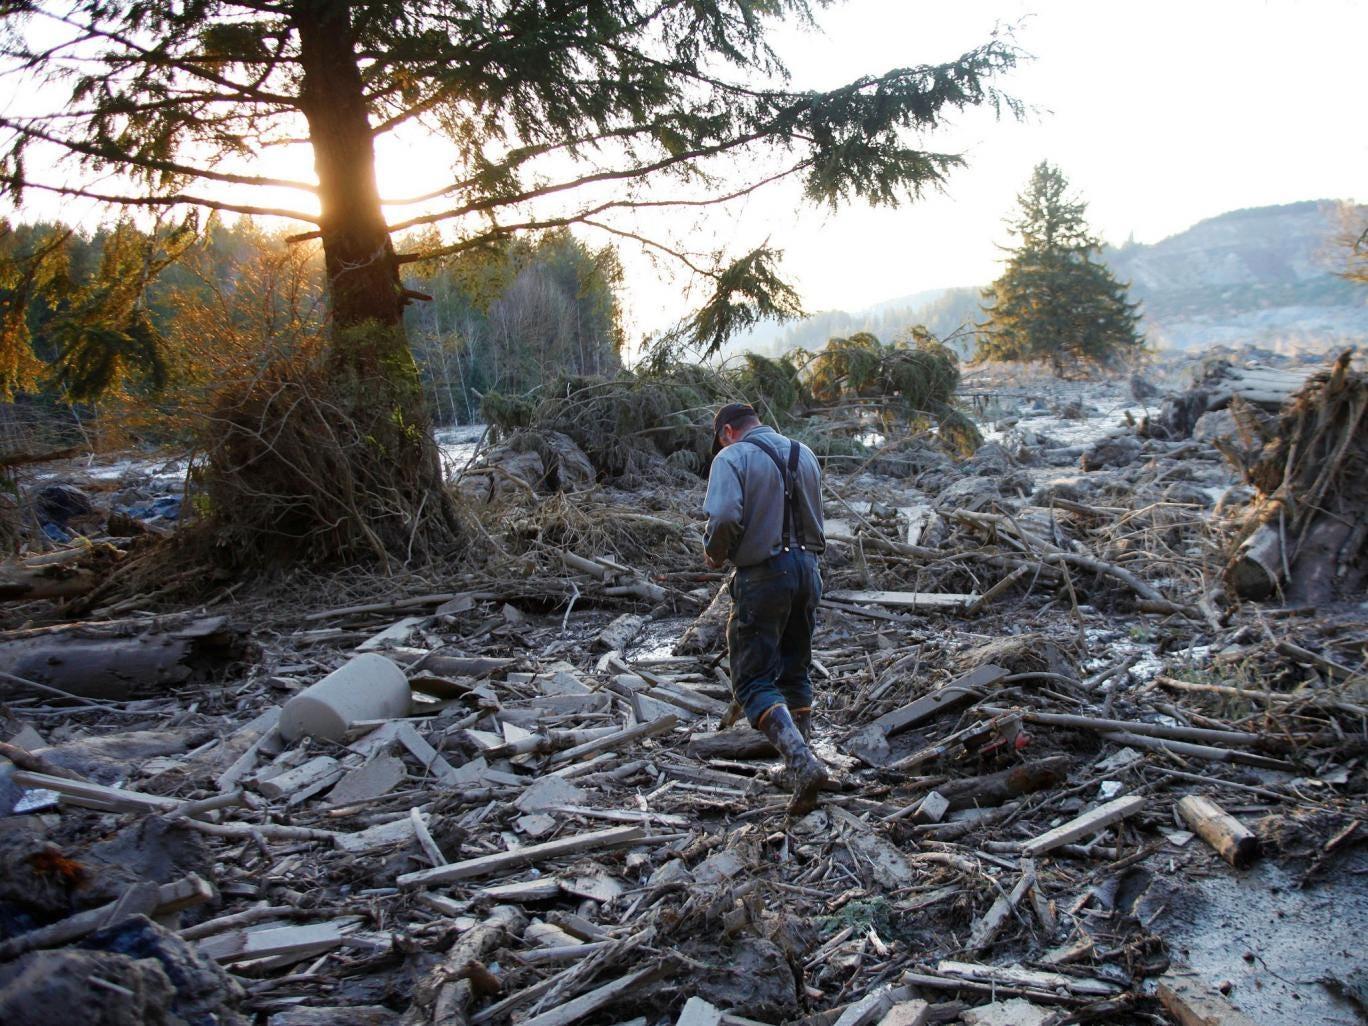 Steve Skaglund walks across the rubble on the east side of Saturday's fatal mudslide near Oso, Wash., Sunday, March 23